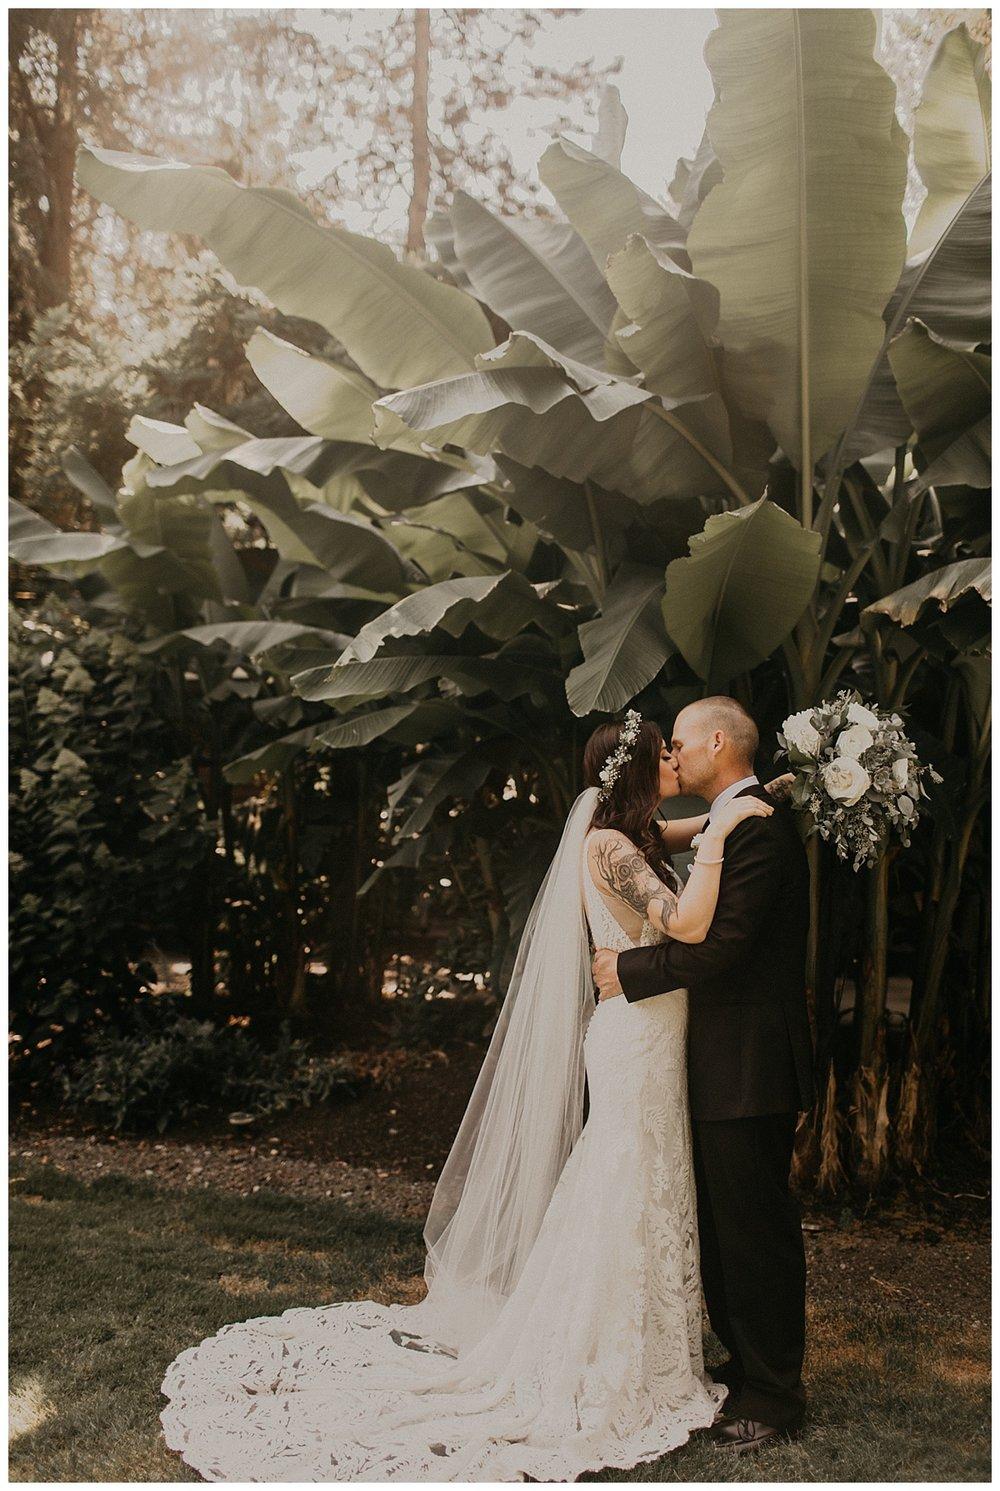 Samantha-McFarlen-PNW-Wedding-Photographer-Maroni-Meadows_1959.jpg